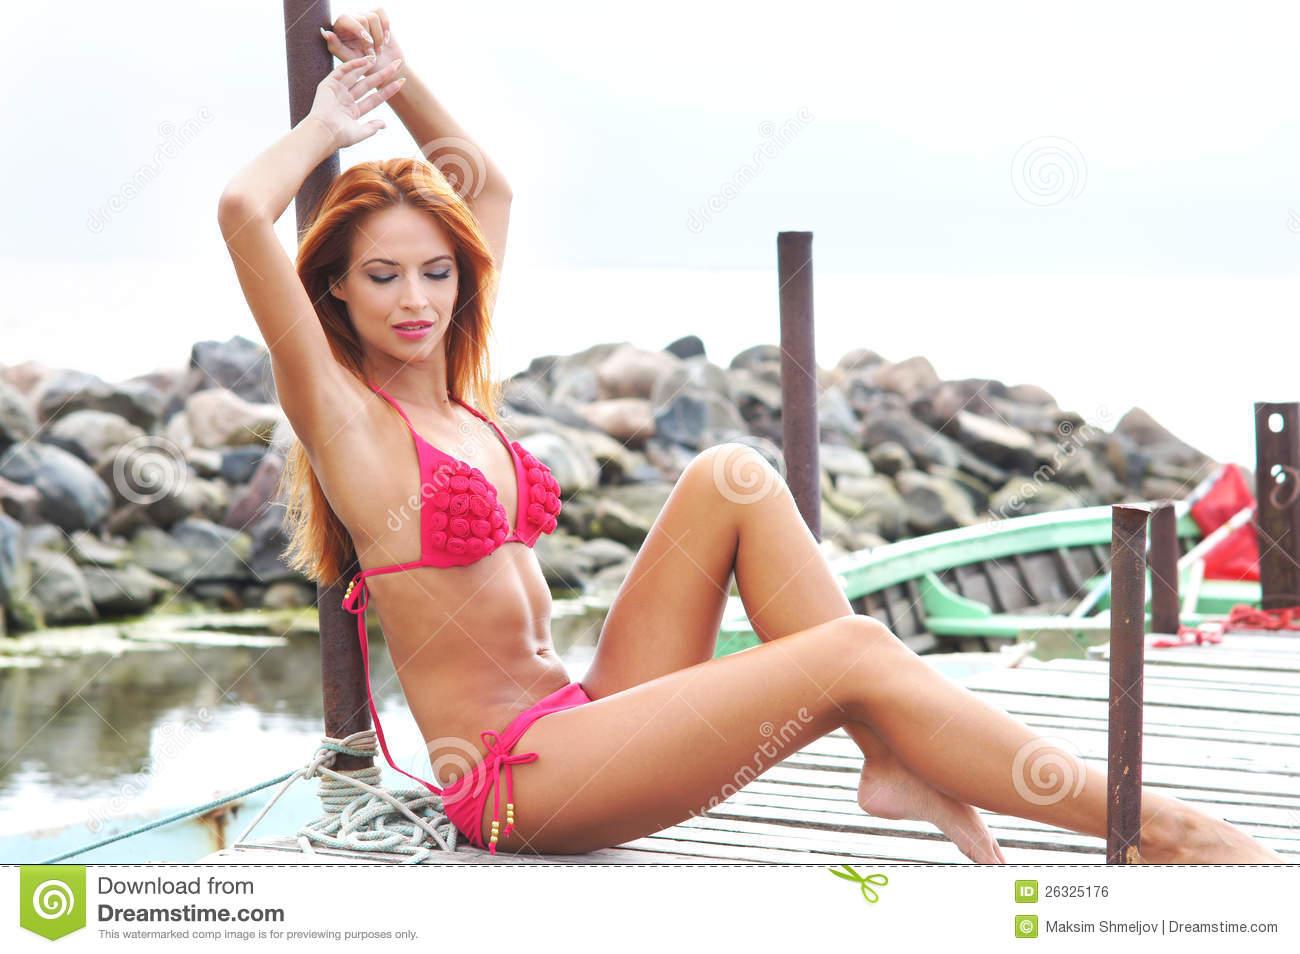 Femme rousse en bikini imagesize:960×640